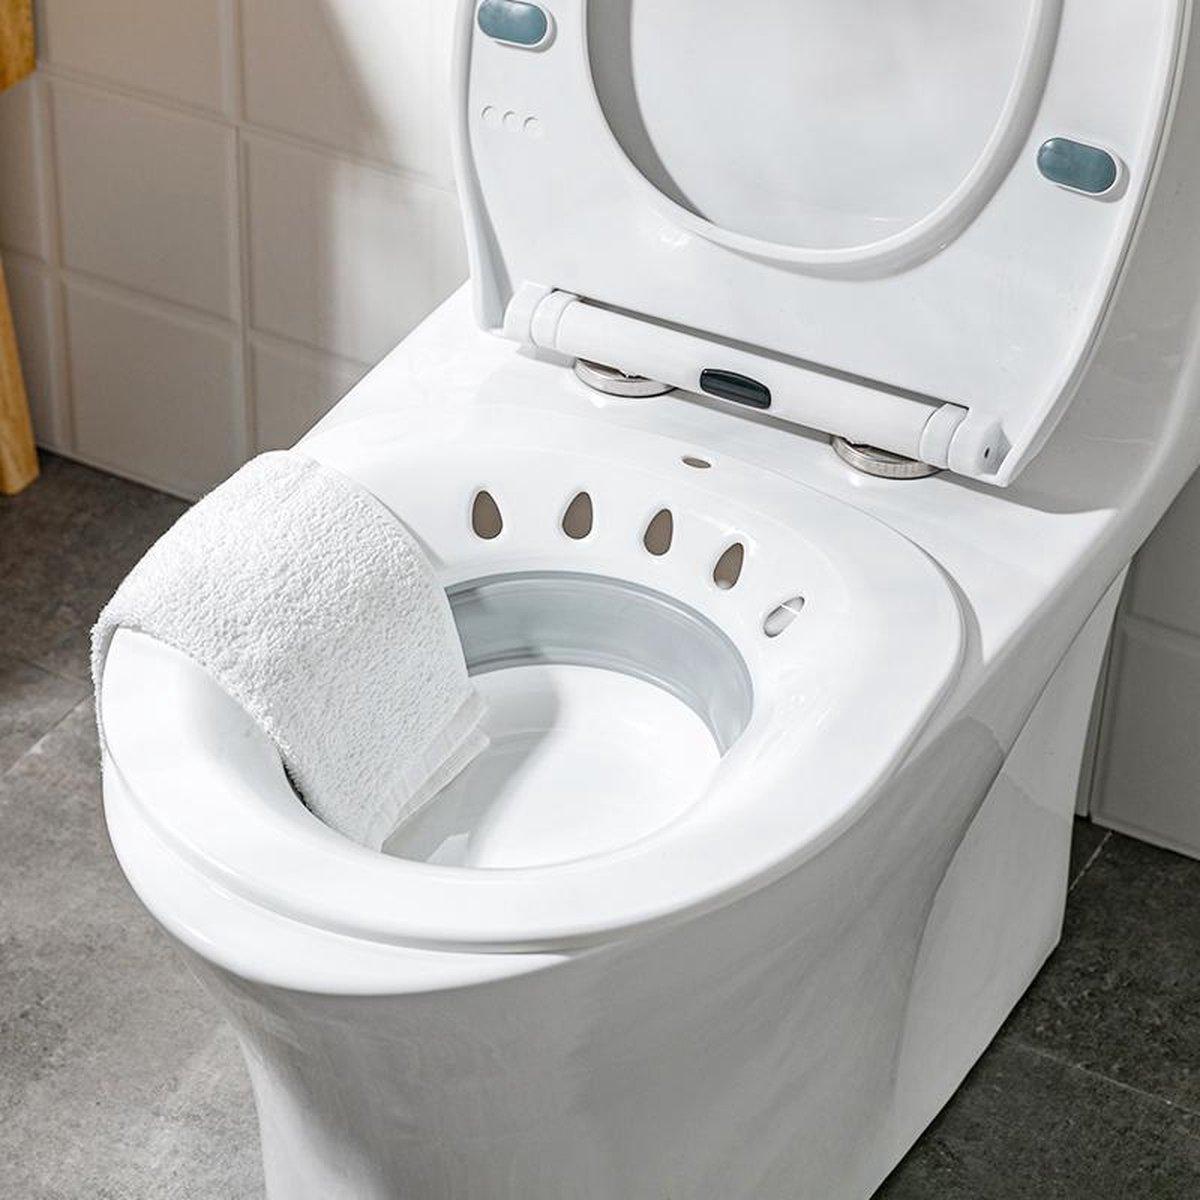 Yoni stoom stoel- Vaginaal stomen- Natuurlijke intieme zone verzorging- V steam bidet - Inklapbaar O